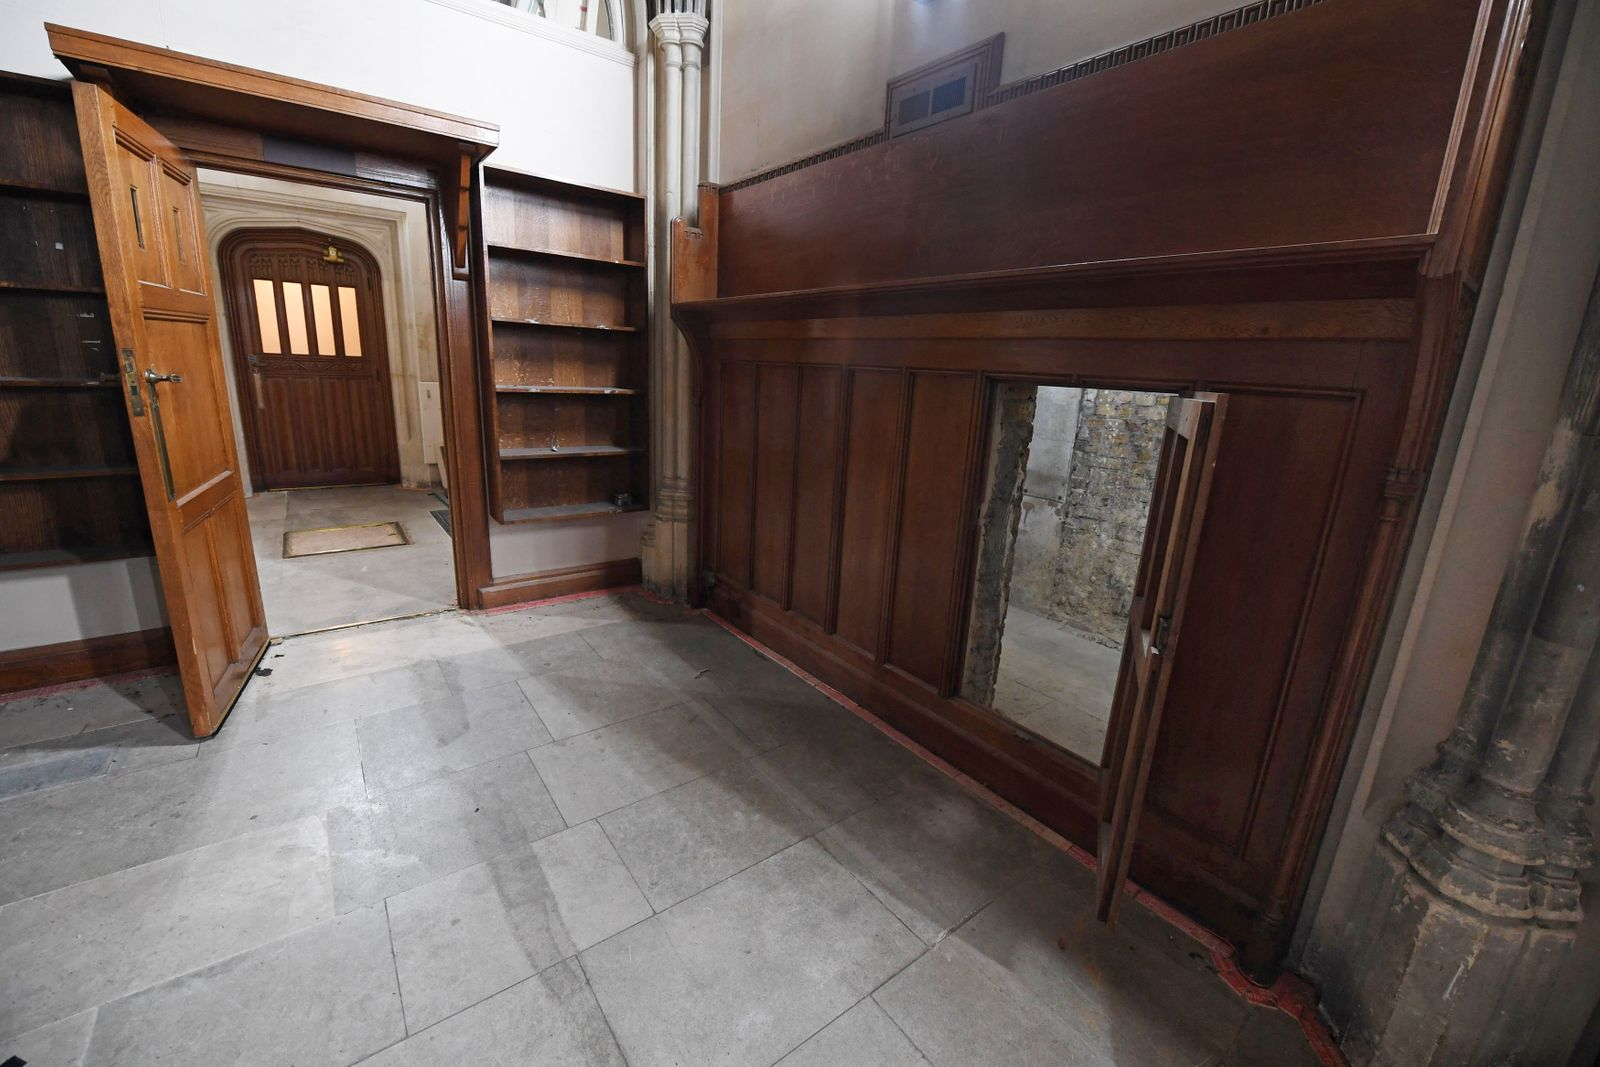 Secret doorway in the House of Commons